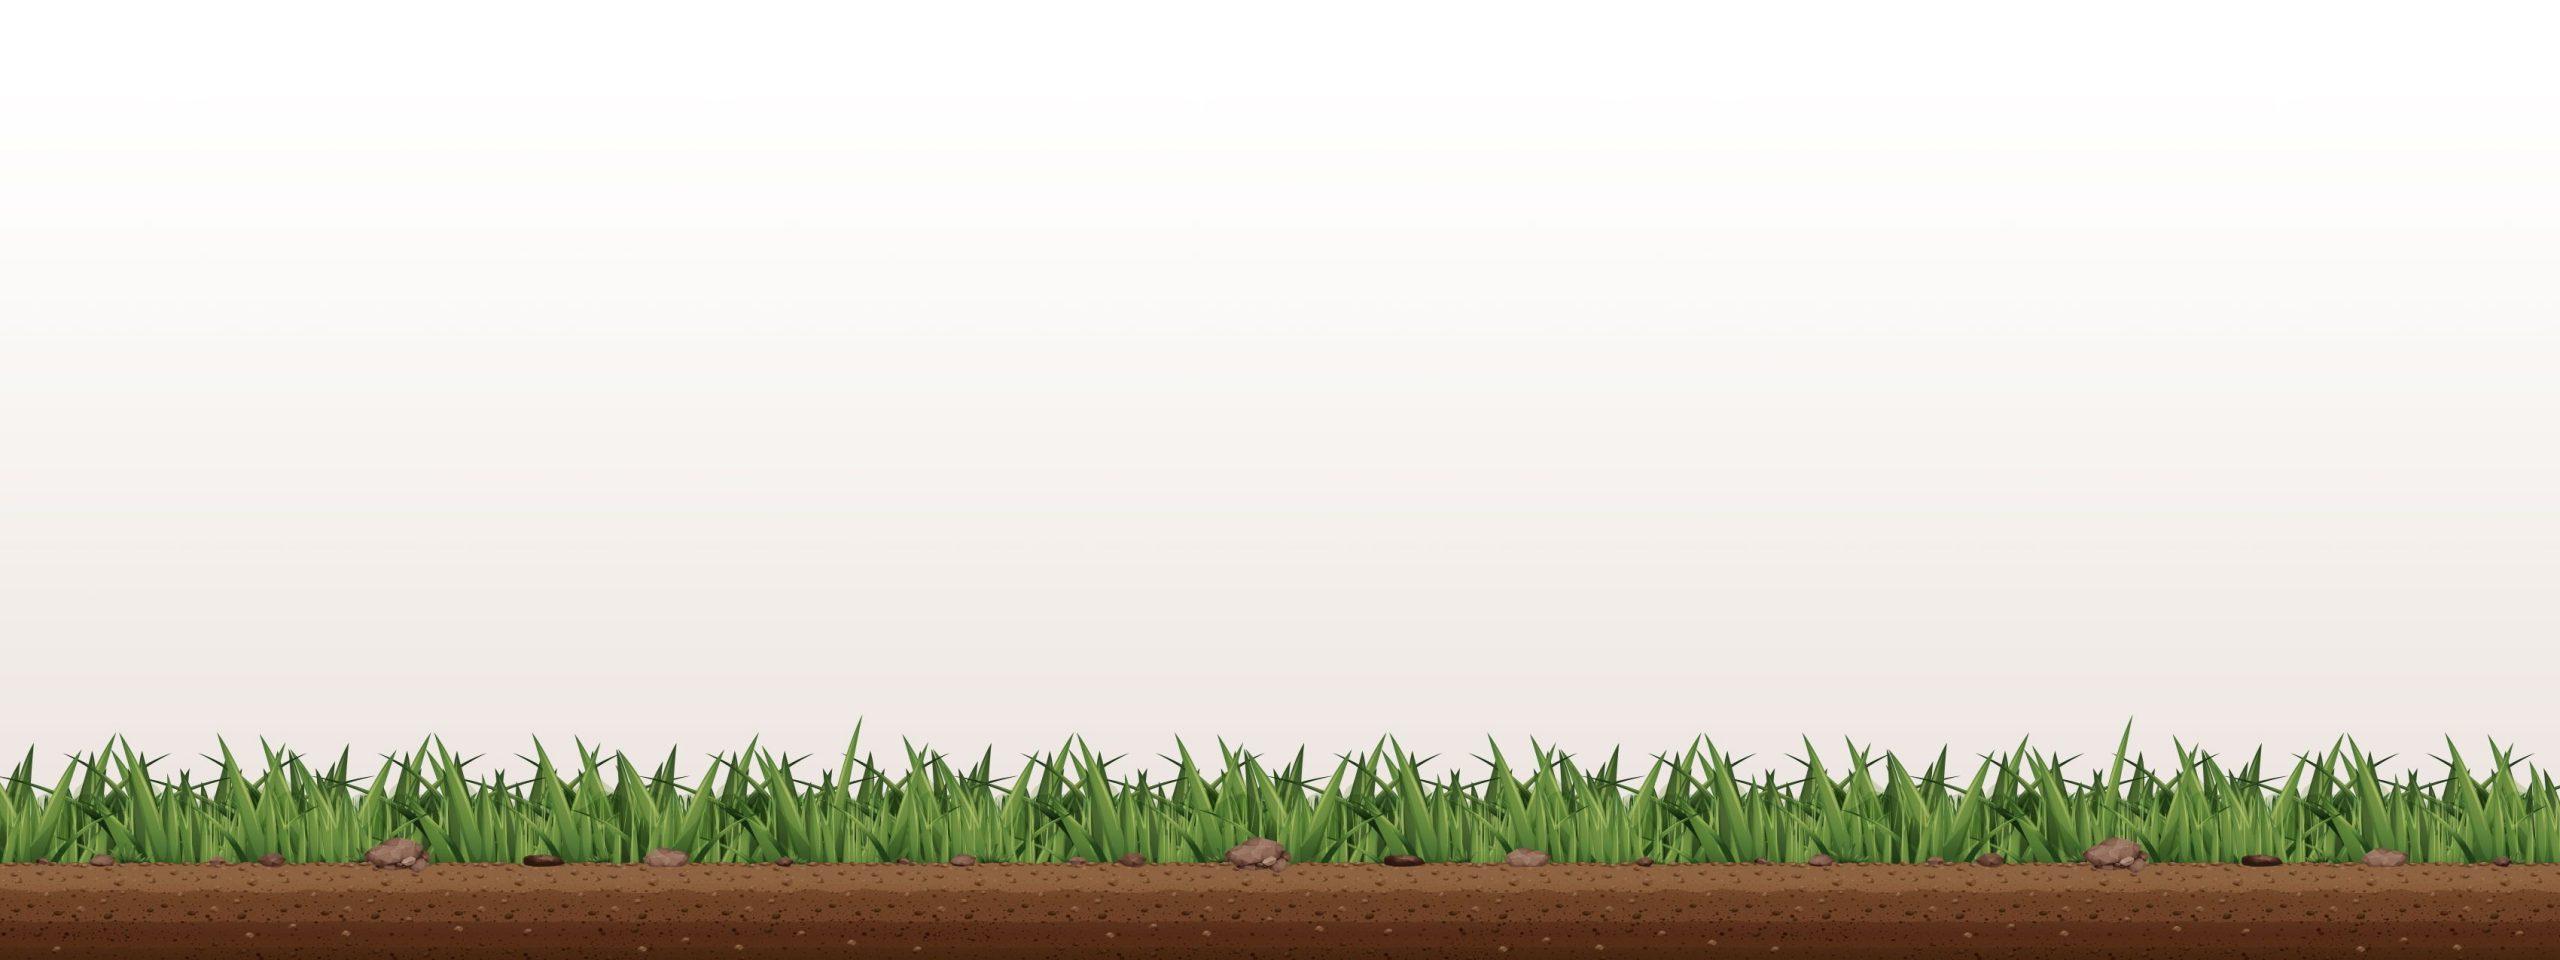 landscaper-grass-background-4